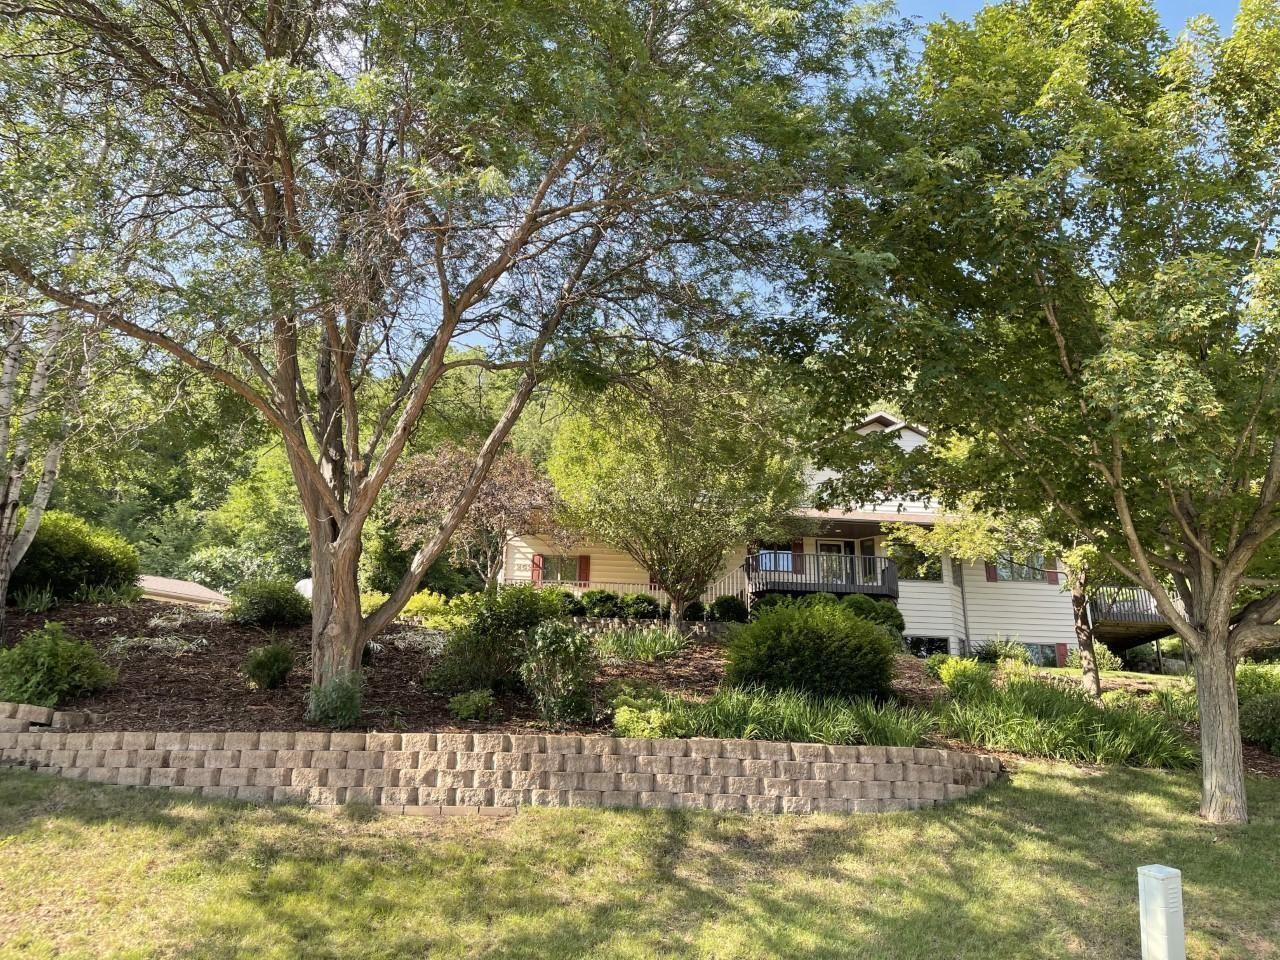 252 Pleasant Hill Drive, Winona, MN 55987 - MLS#: 6070612